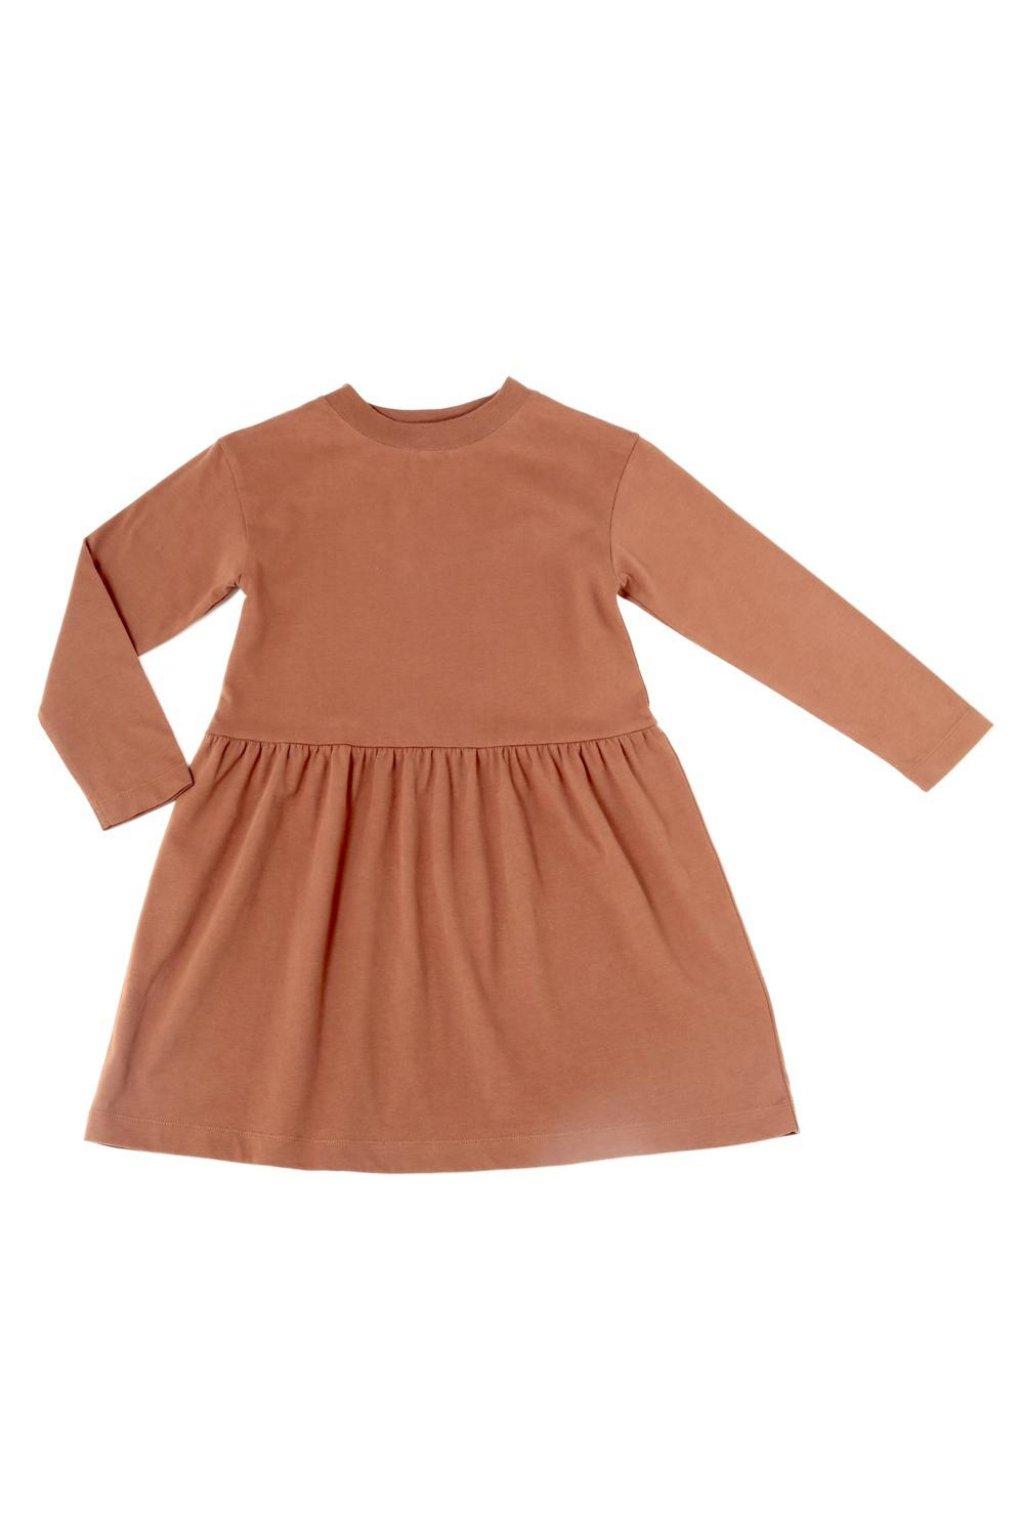 SPINN-AROUND DRESS - CARAMEL COOKIE